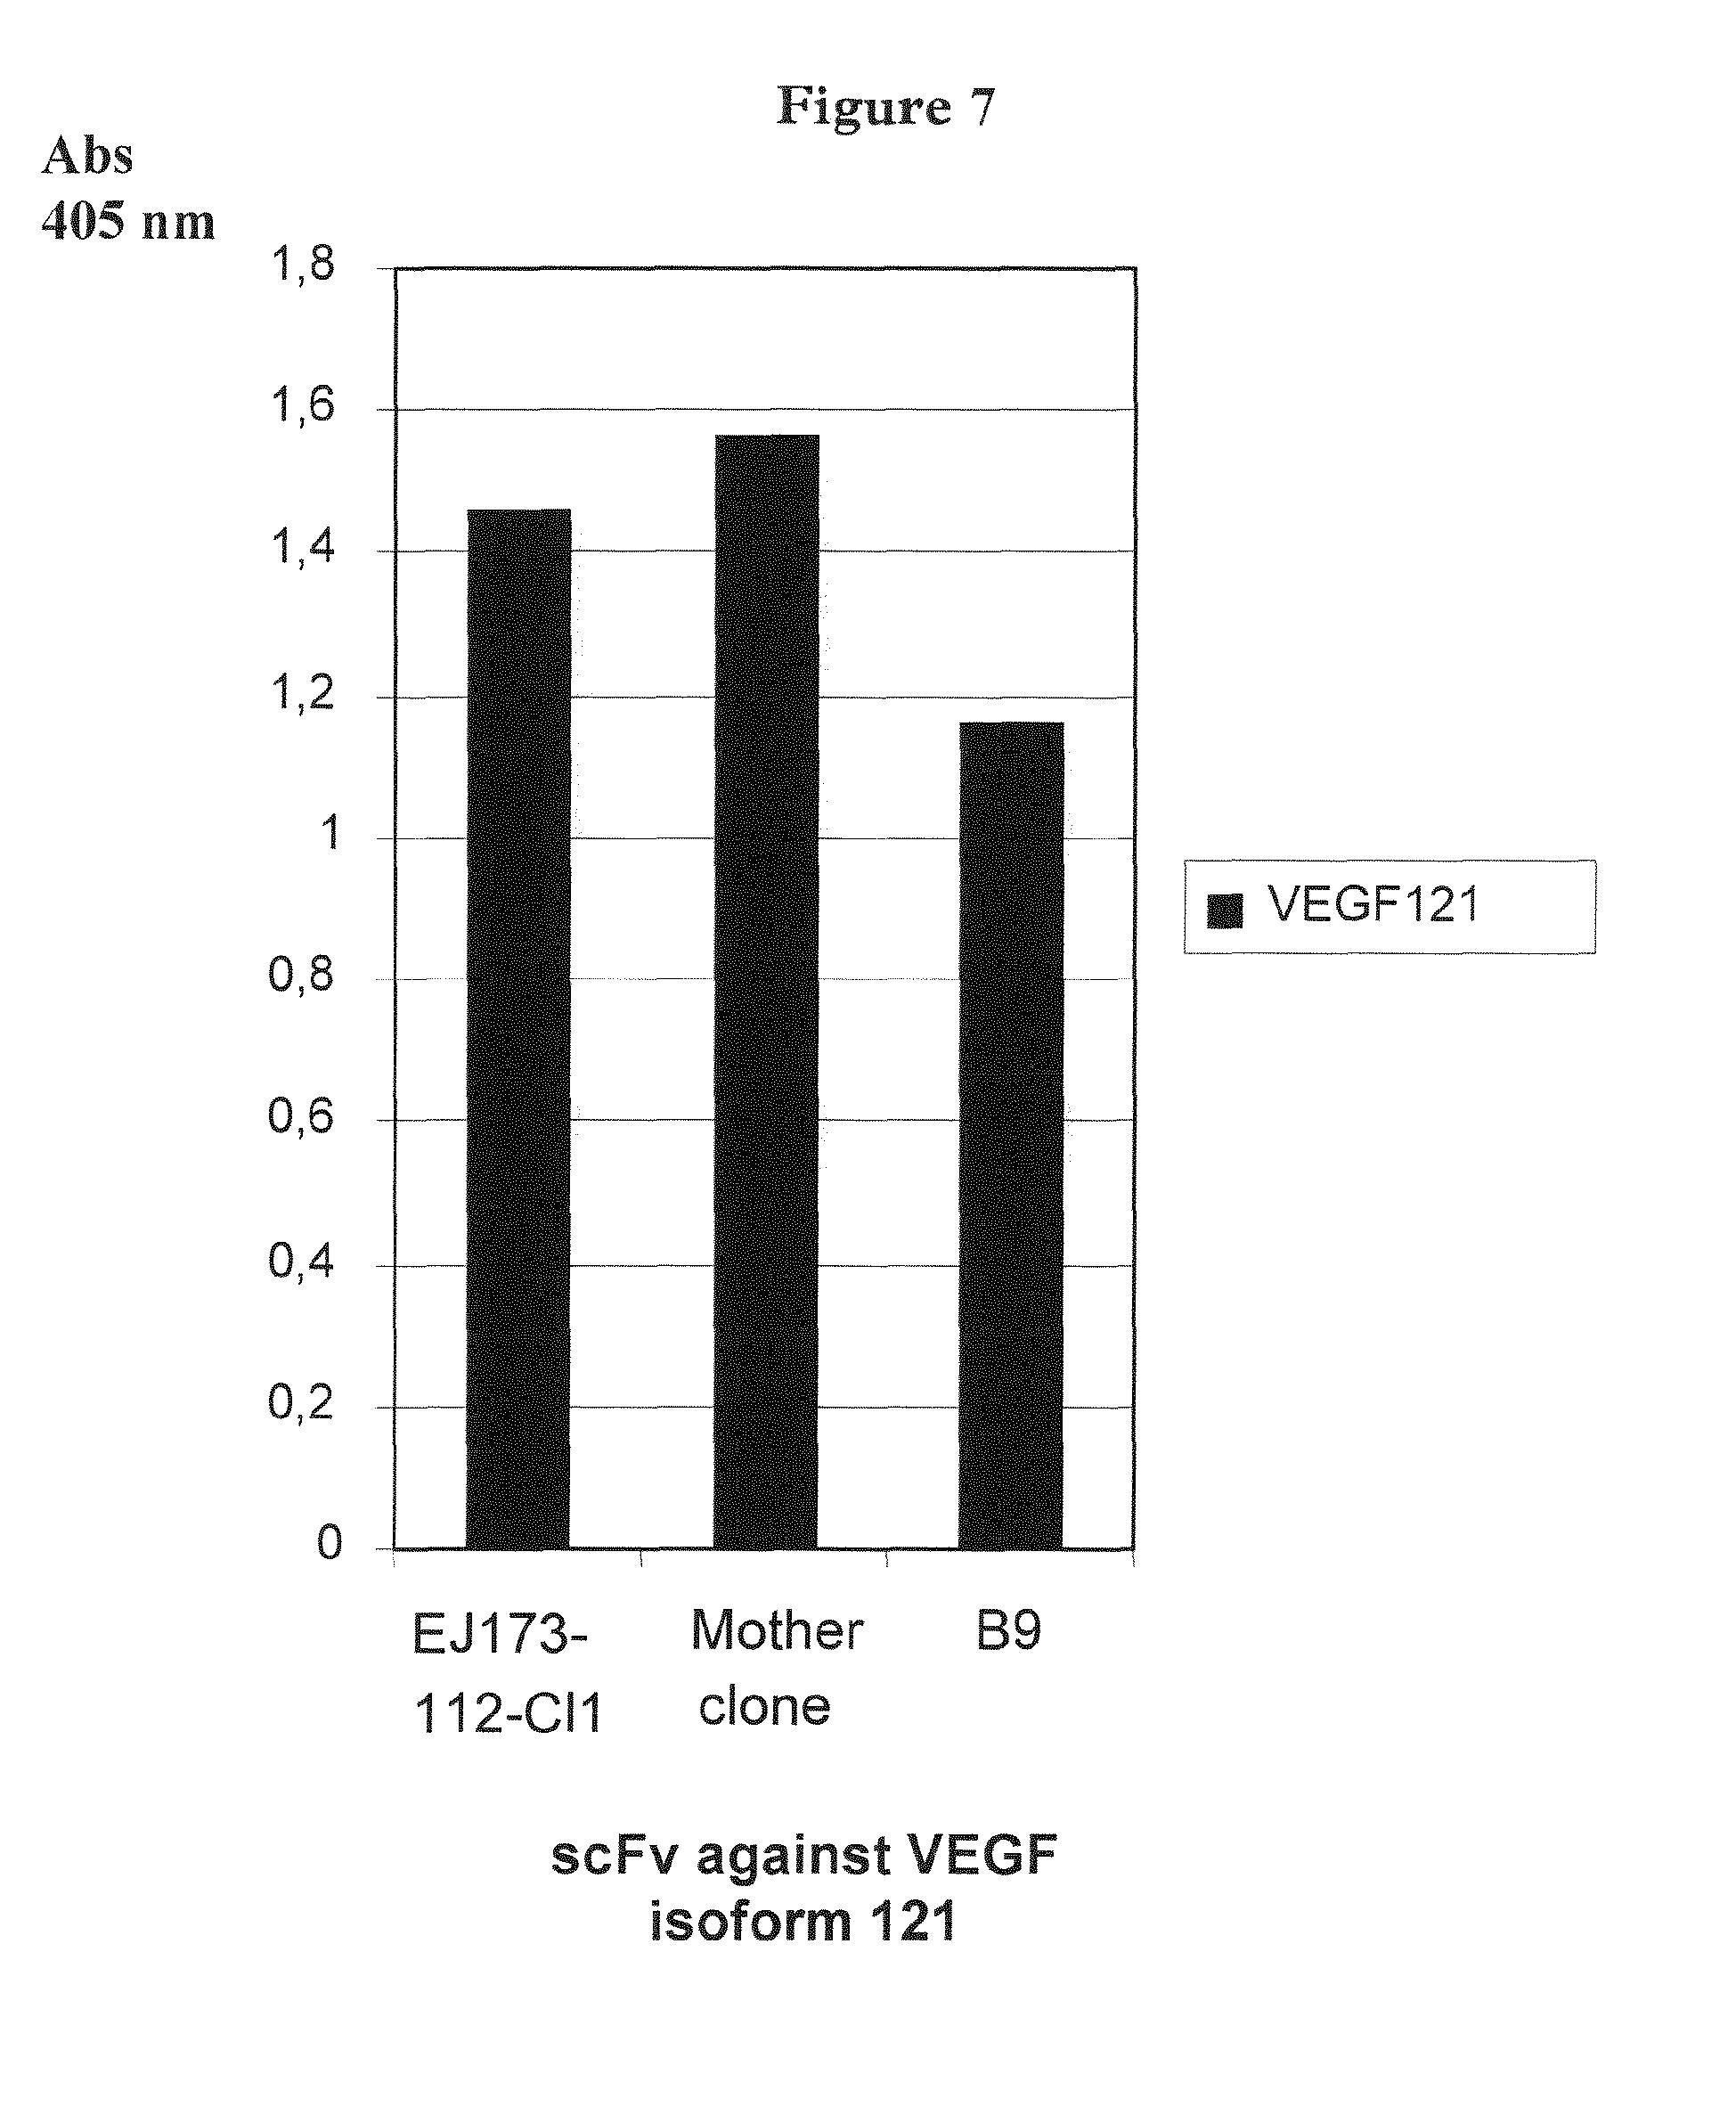 Anticorps anti-VEGF